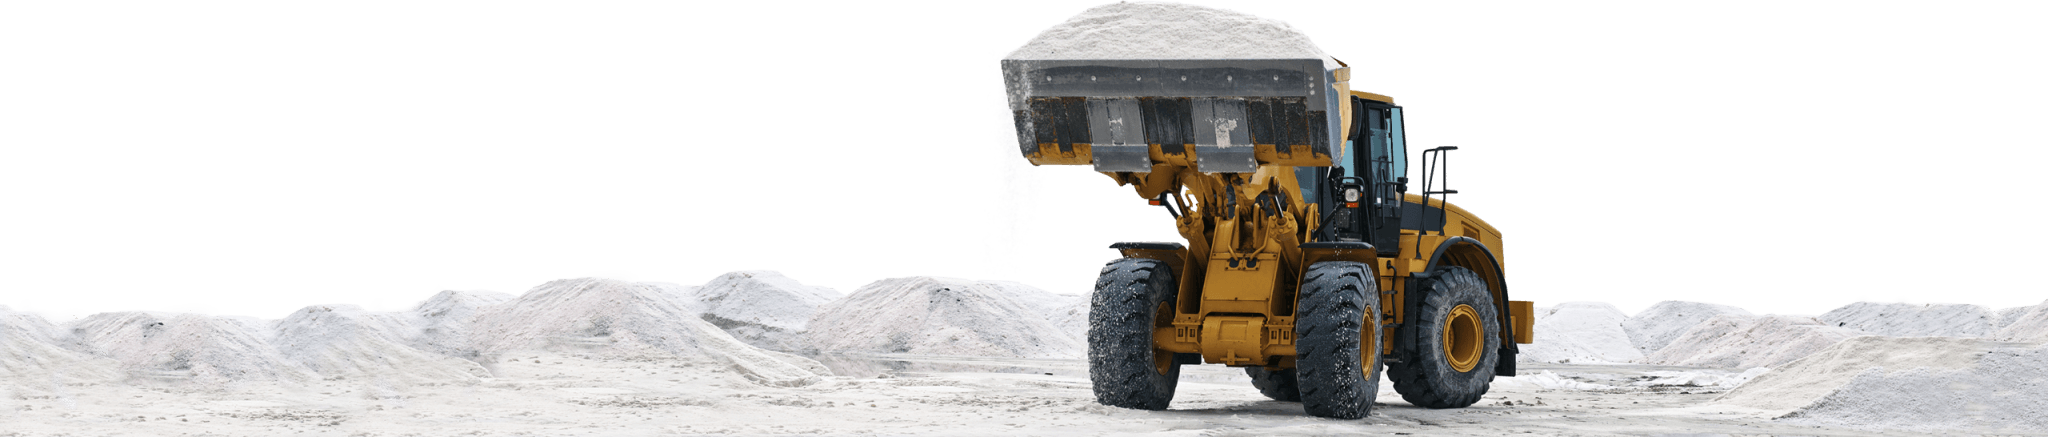 bulk Road Salt Tractor